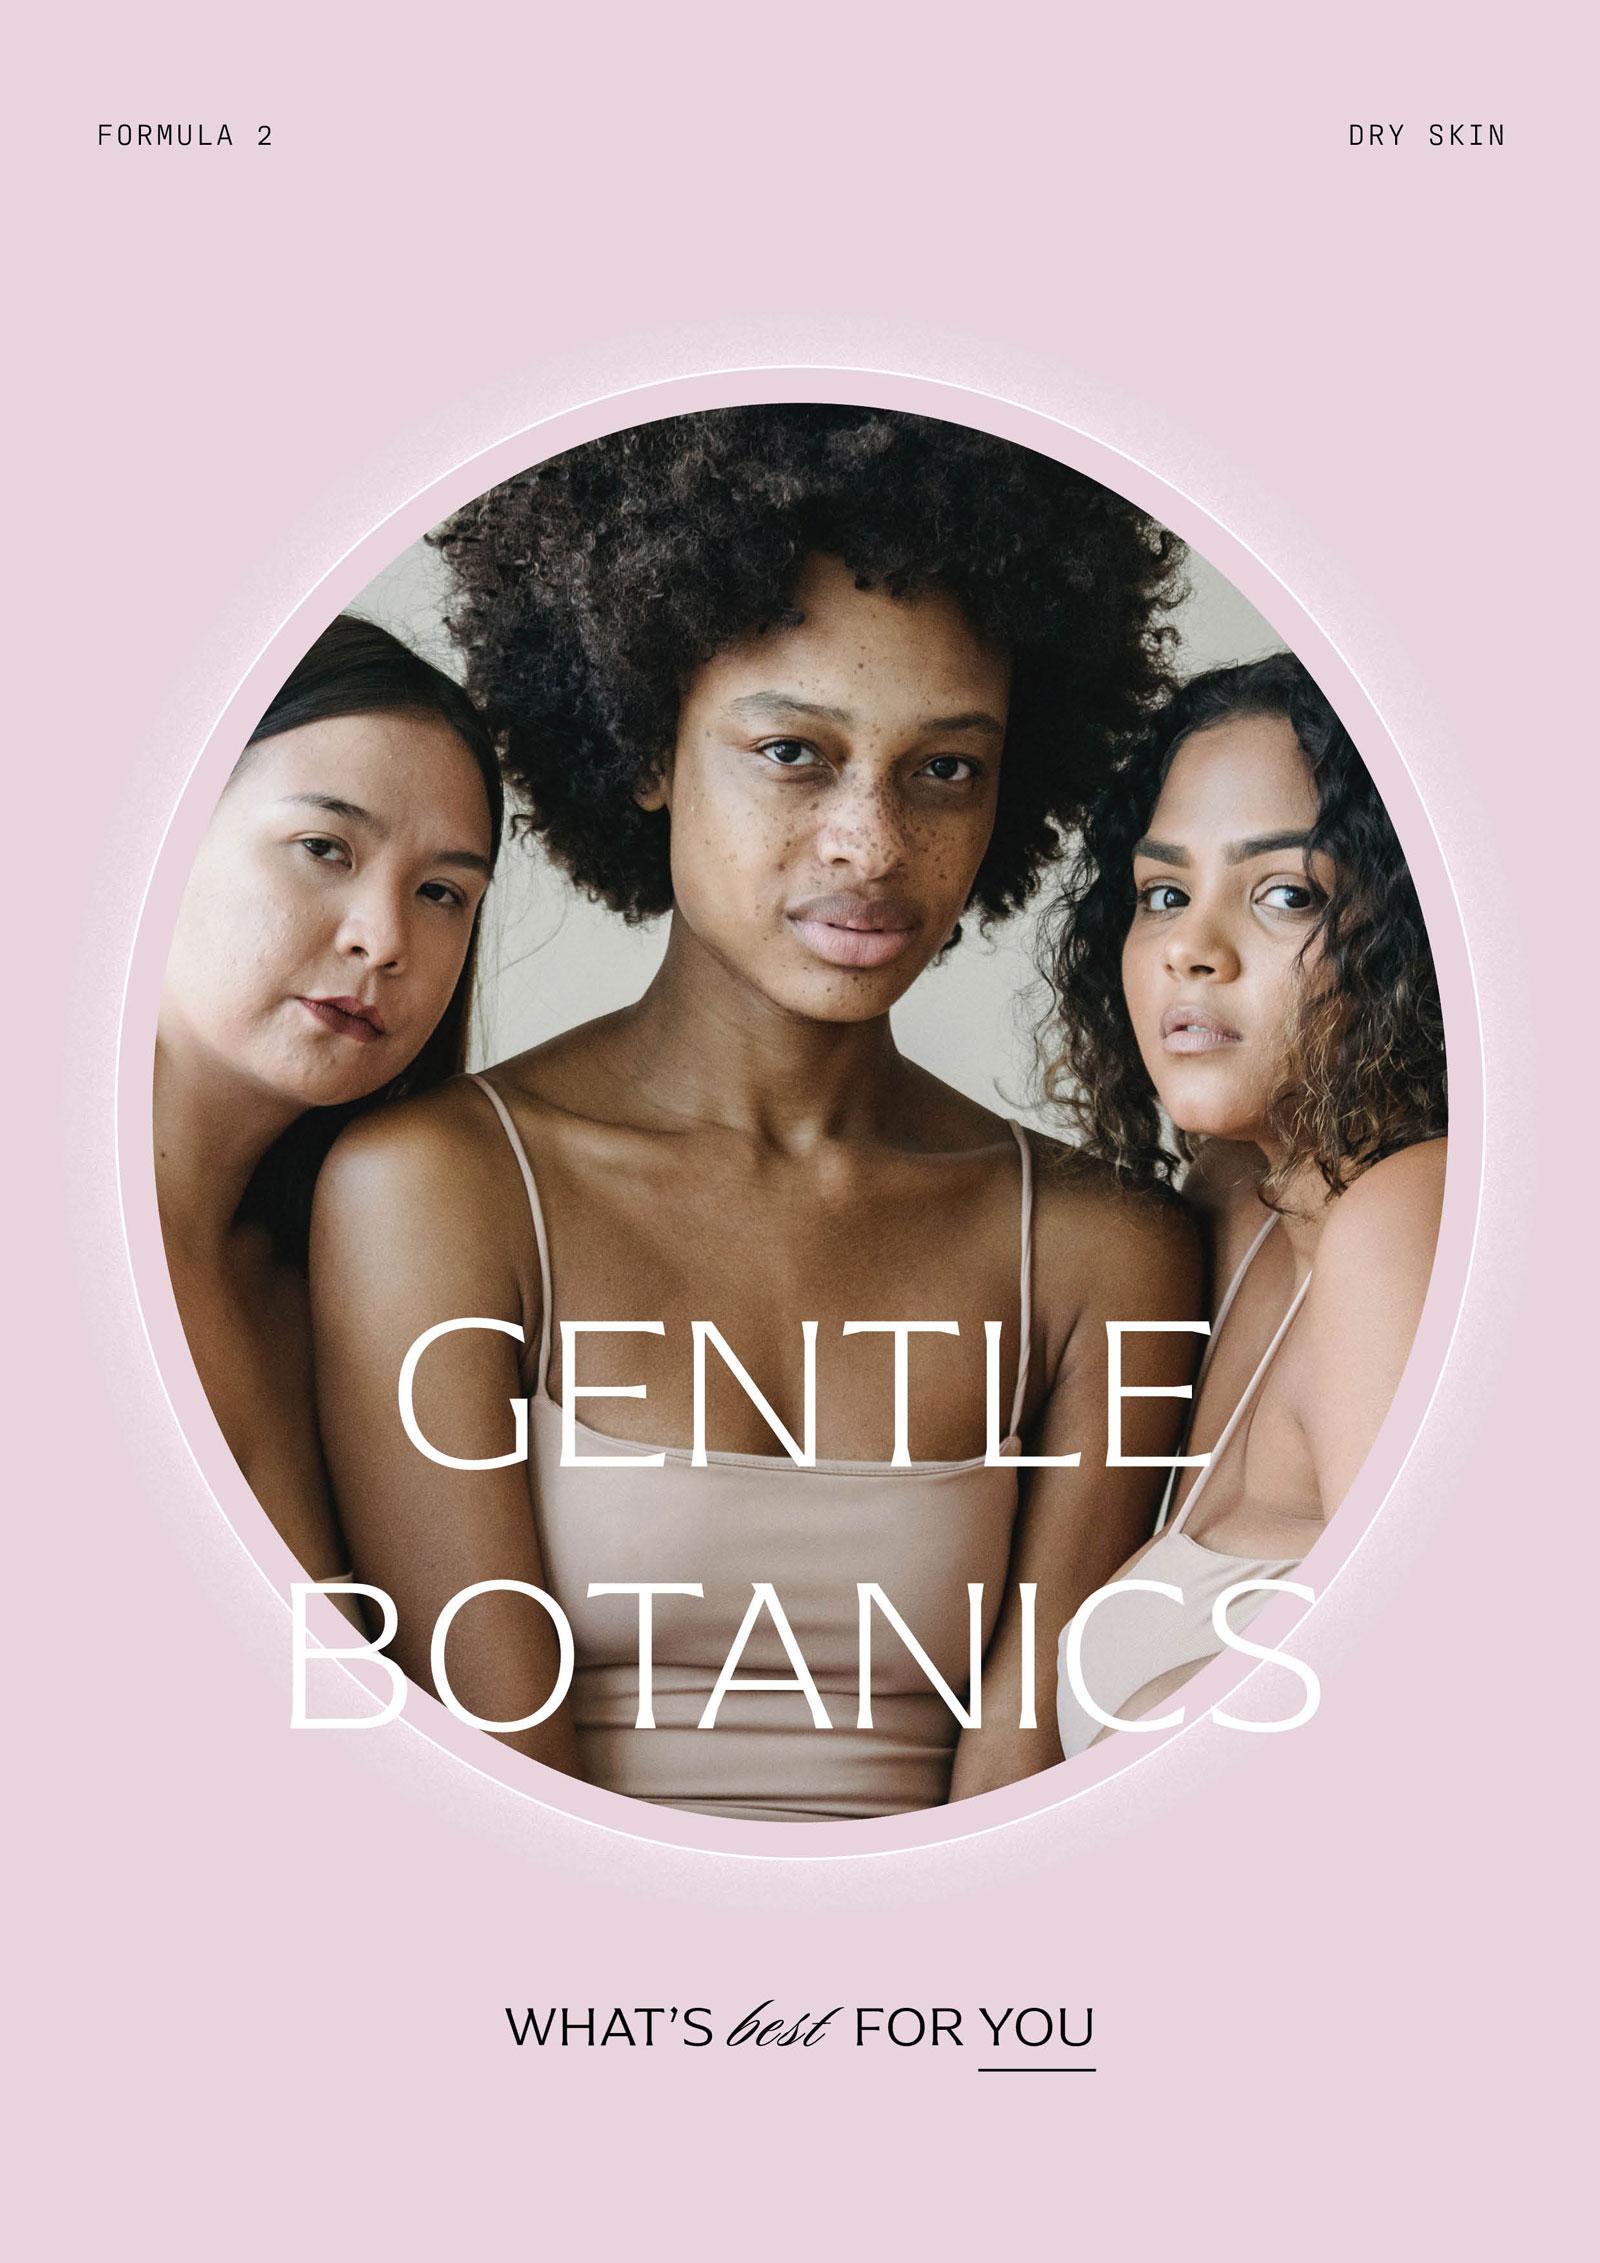 Gentle Botanics Skincare Brand Kit – Advert / Werbeanzeige